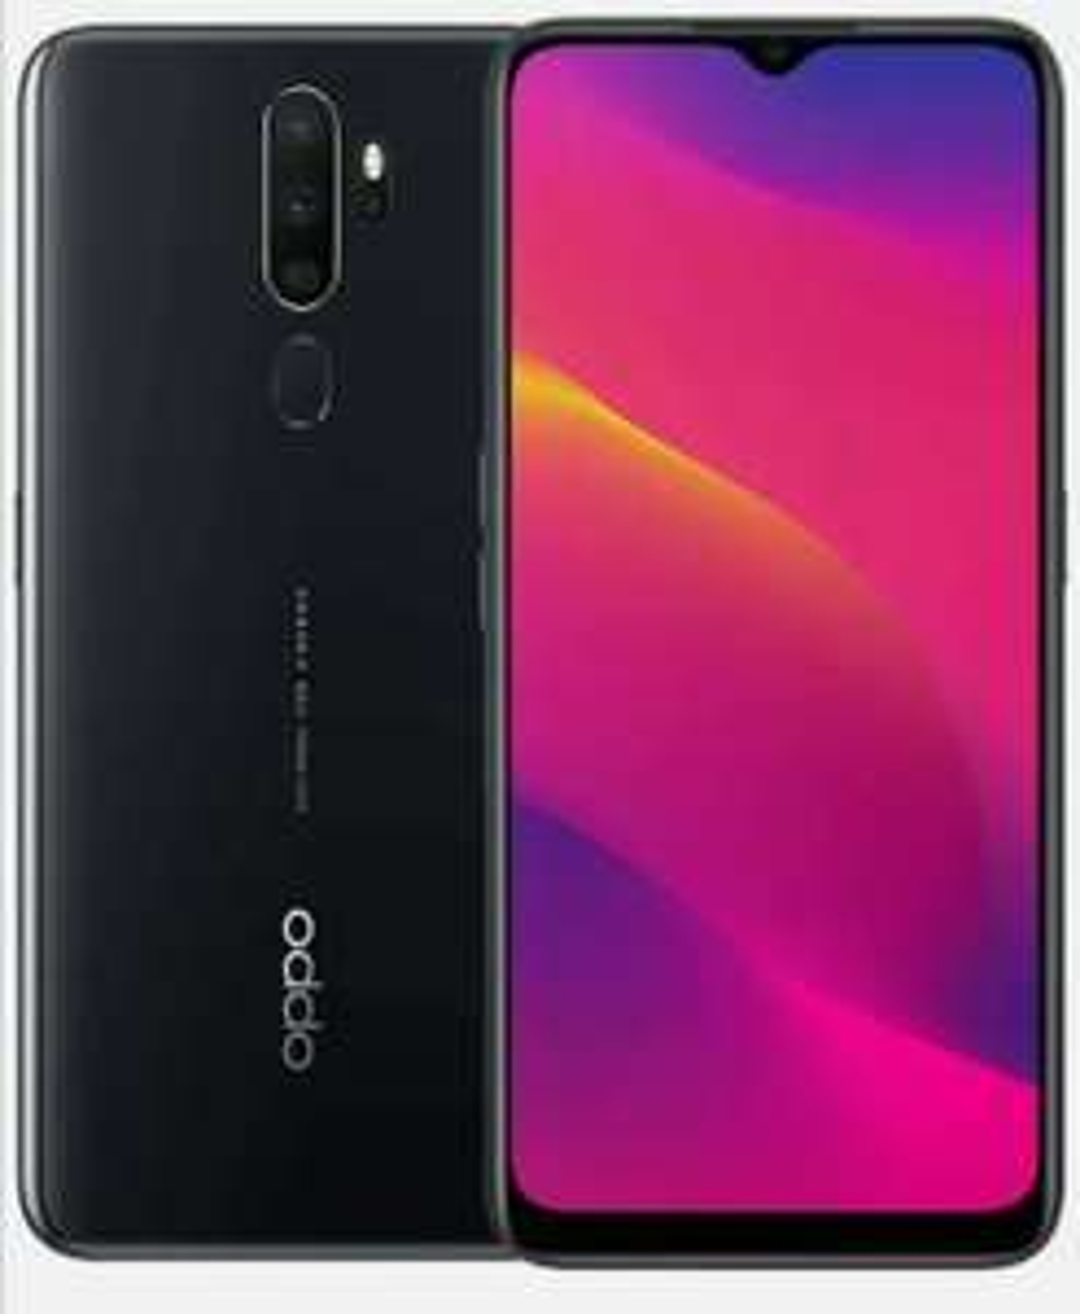 "New Oppo A5 2020 Black 6.50"" 64GB Dual SIM 5000mAh Smartphone - £79.19 With Code @ Technolec / Ebay"